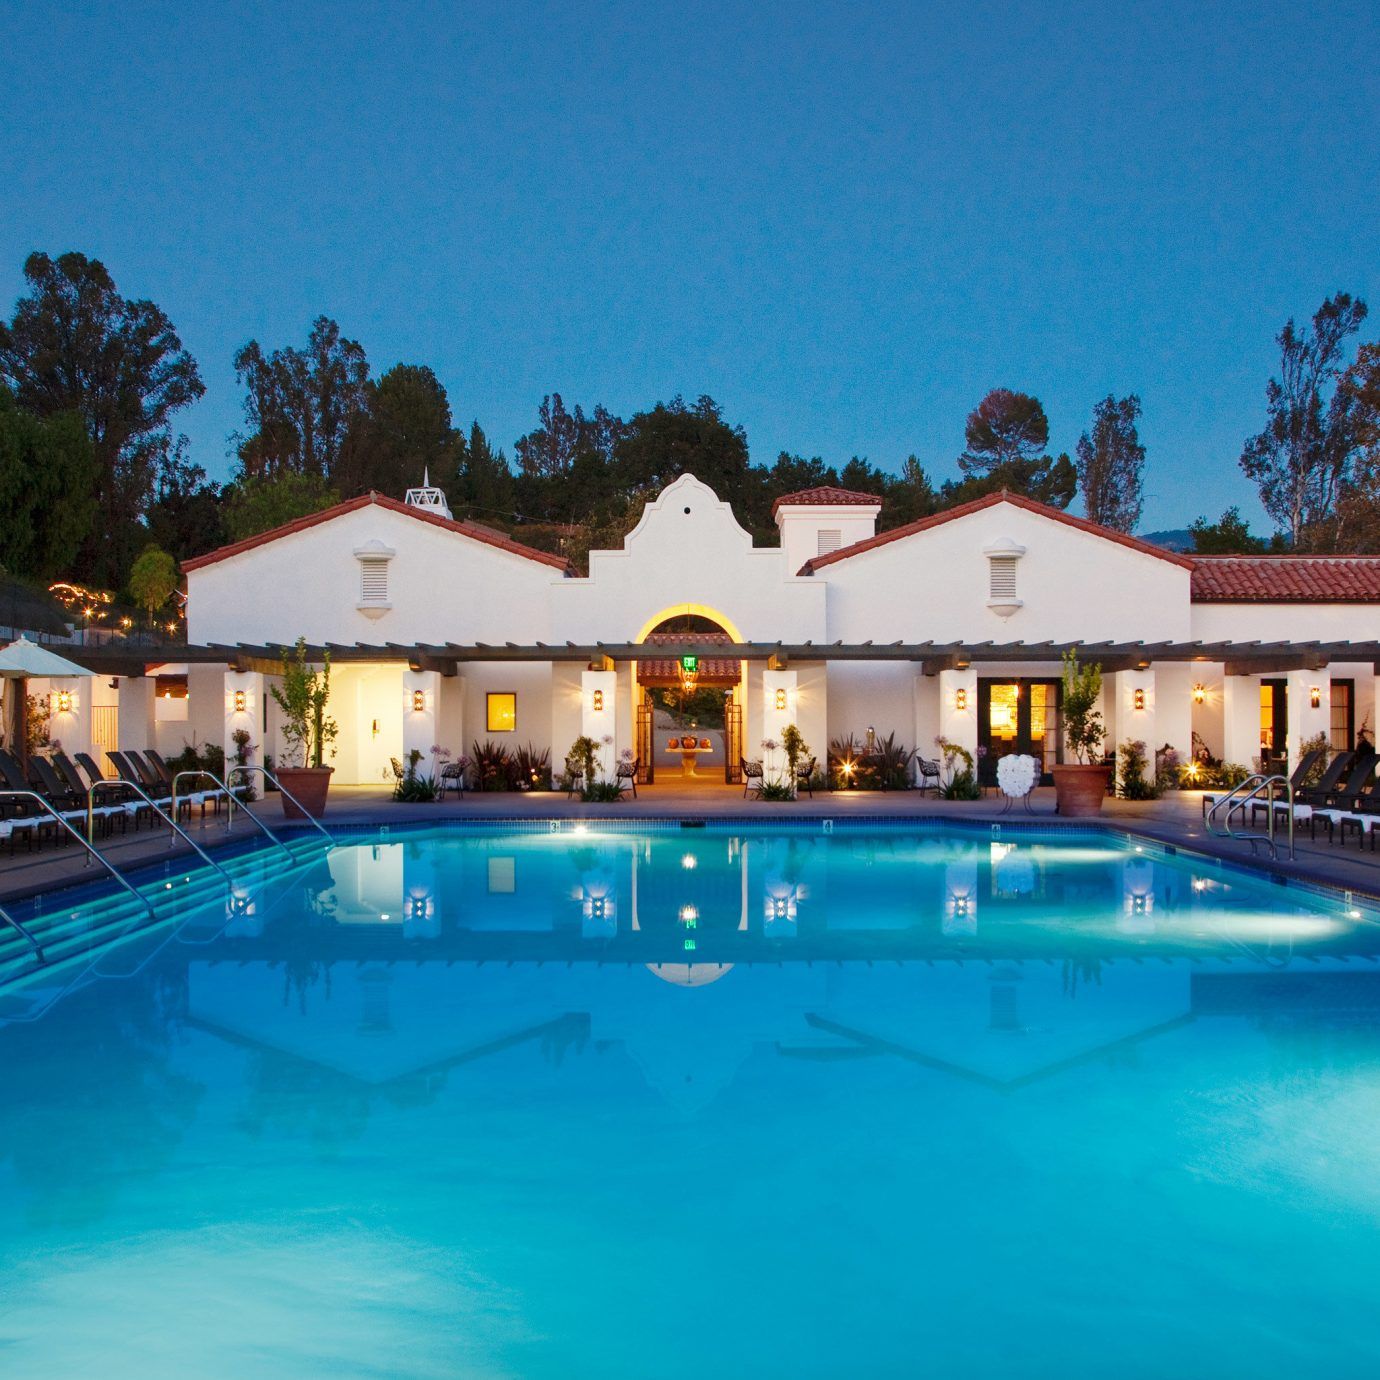 Eco Pool Style + Design water Resort swimming pool property leisure blue Villa resort town swimming mansion